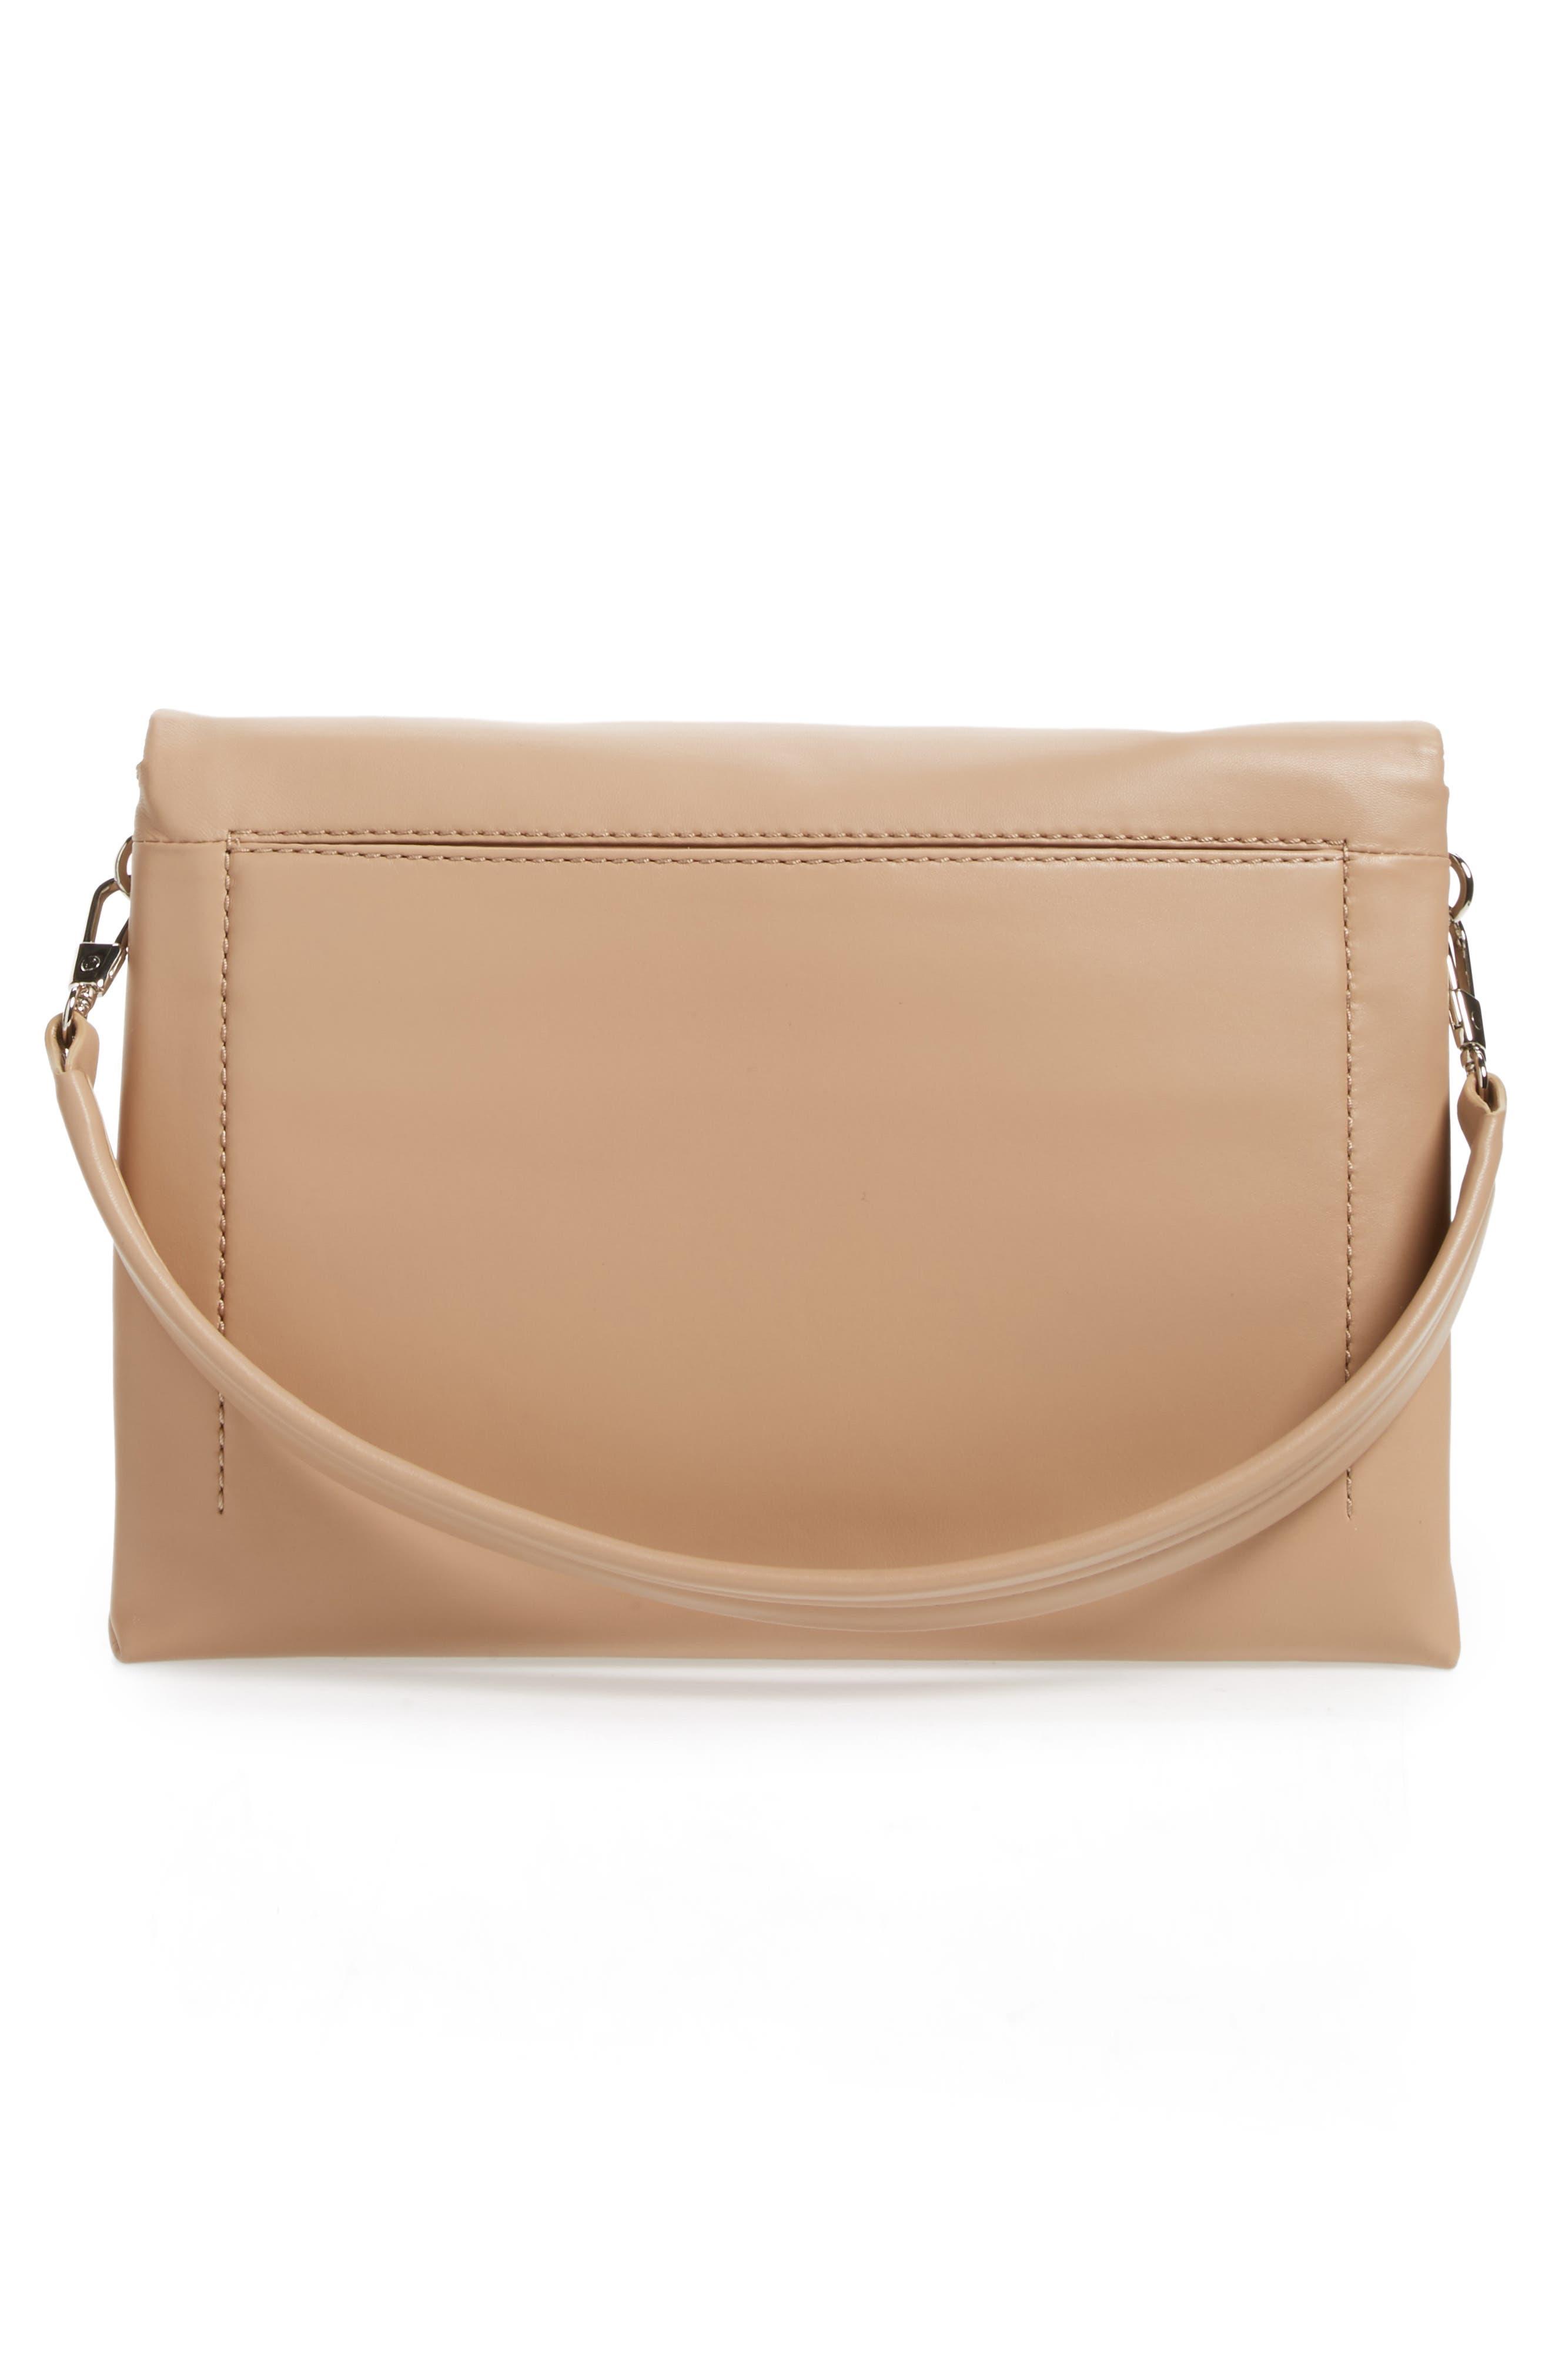 Oversized Alix Flap Leather Shoulder Bag,                             Alternate thumbnail 3, color,                             Fawn